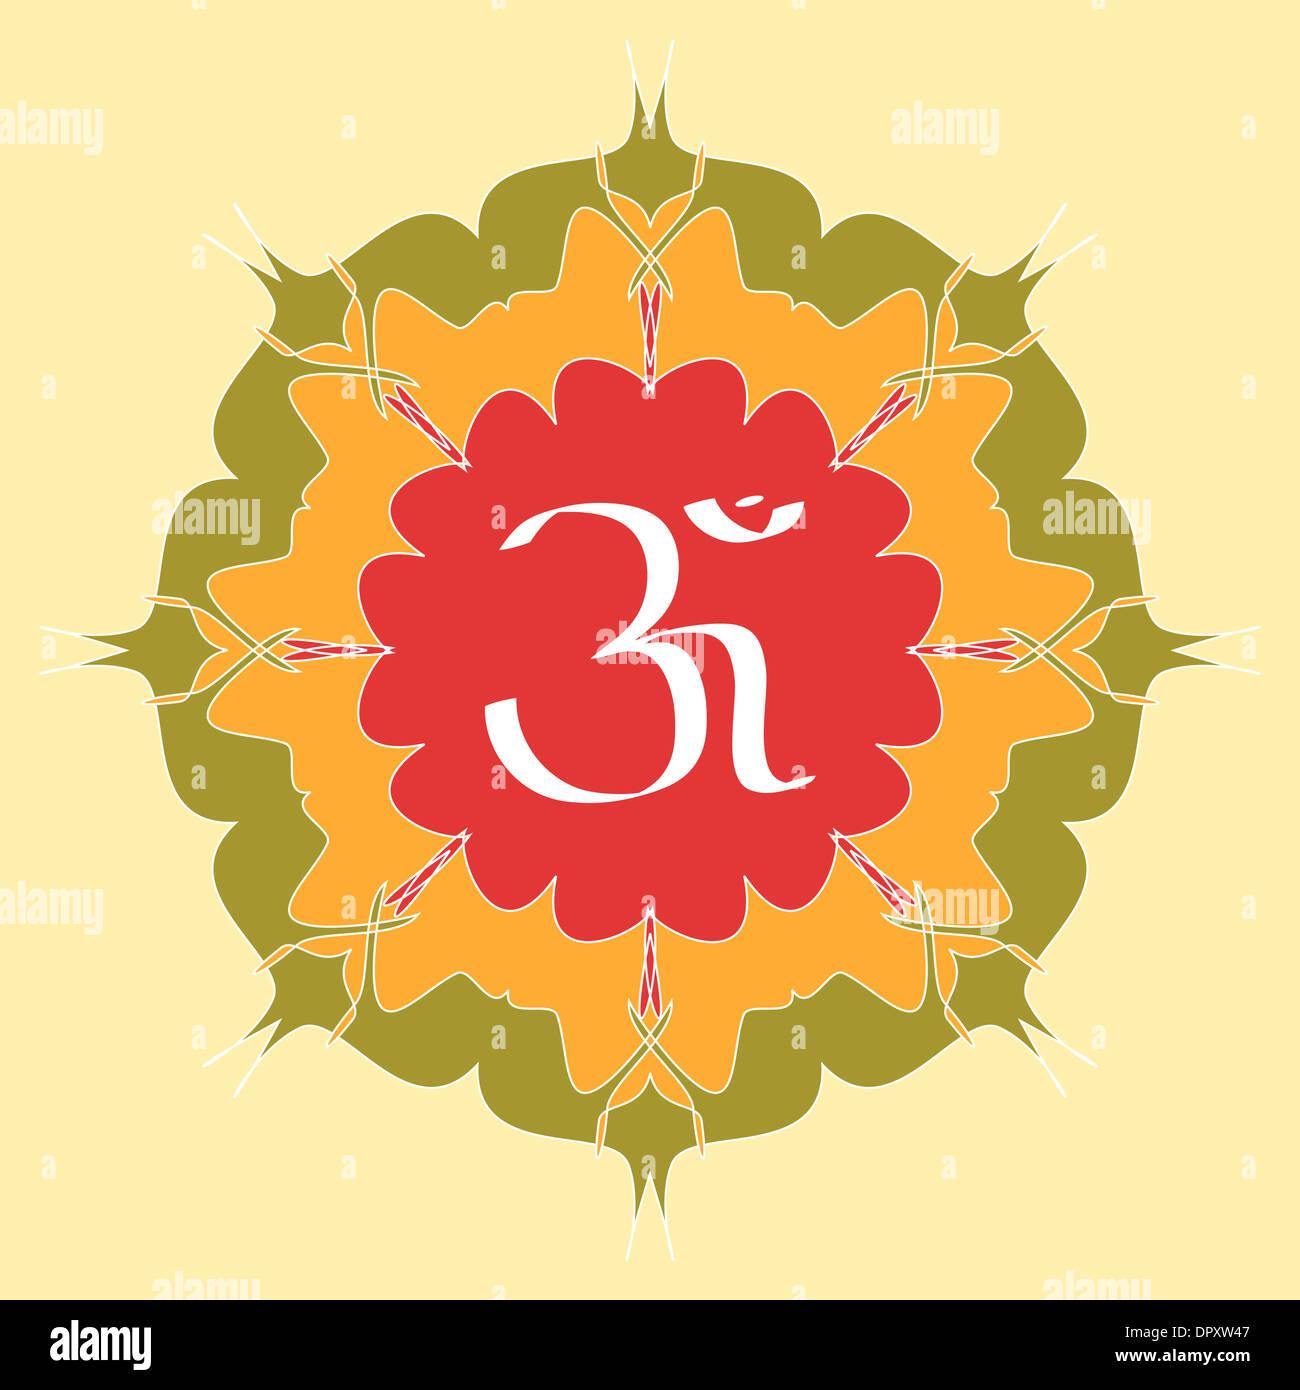 OM symbol on flower Stock Photo